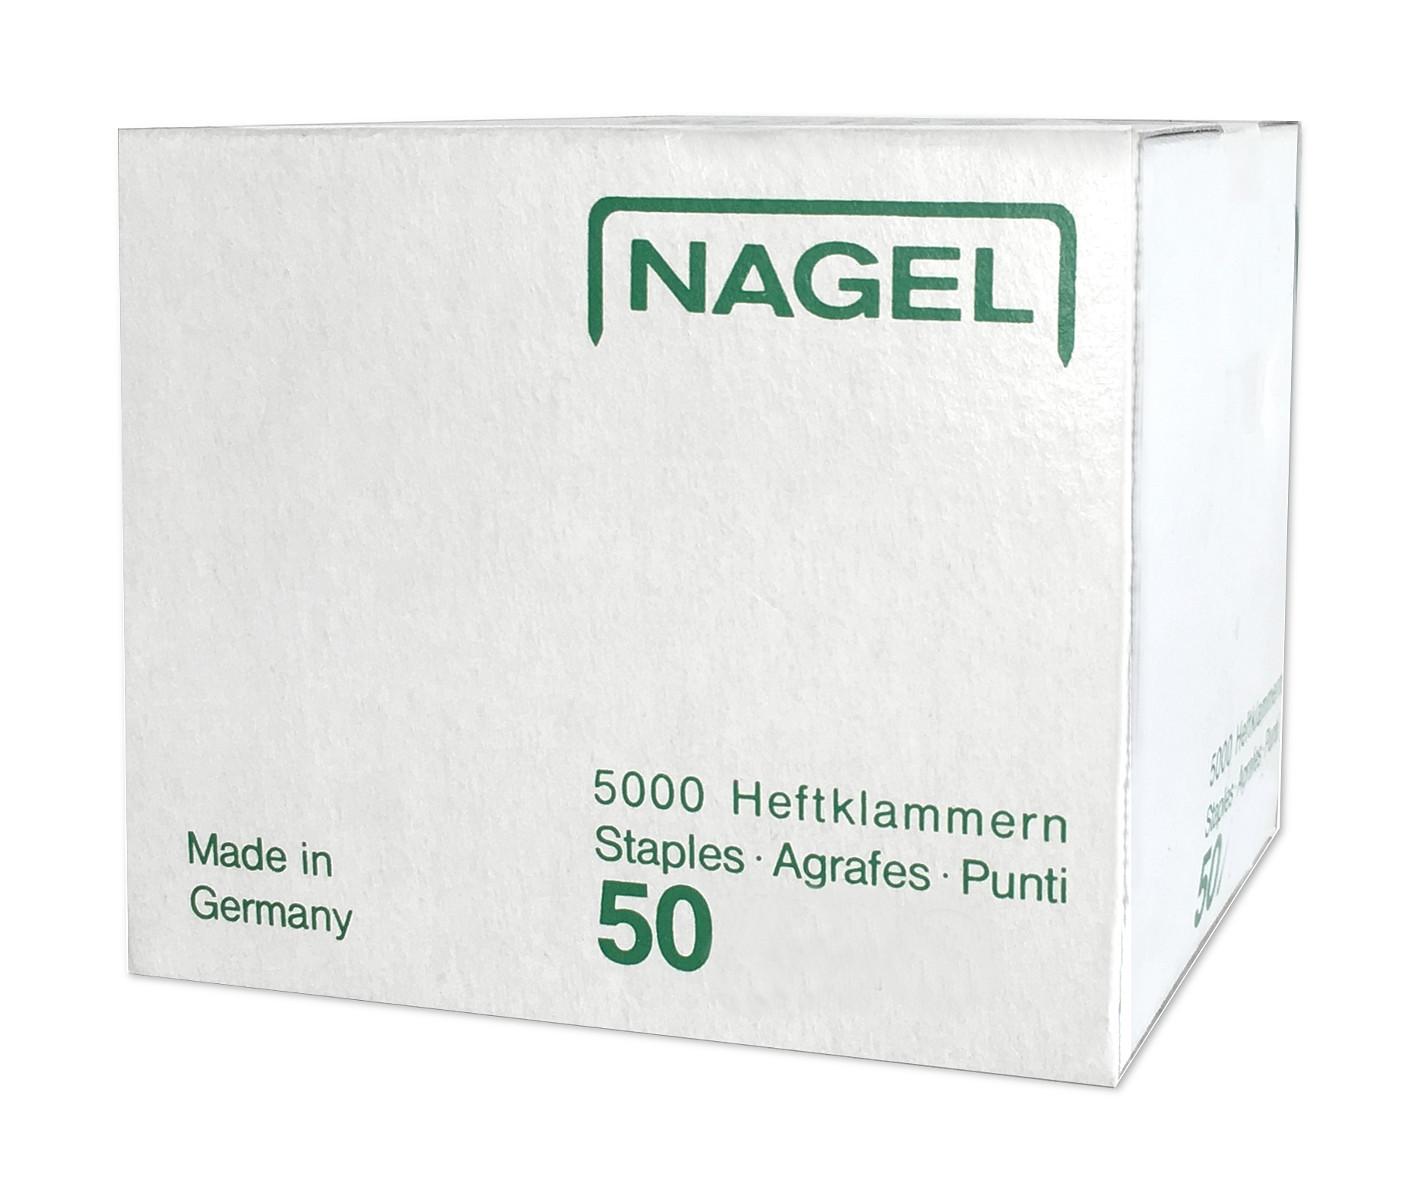 NAGEL Heftklammern 50/10 verzinkt | FritzAdamShop.de - Die ...